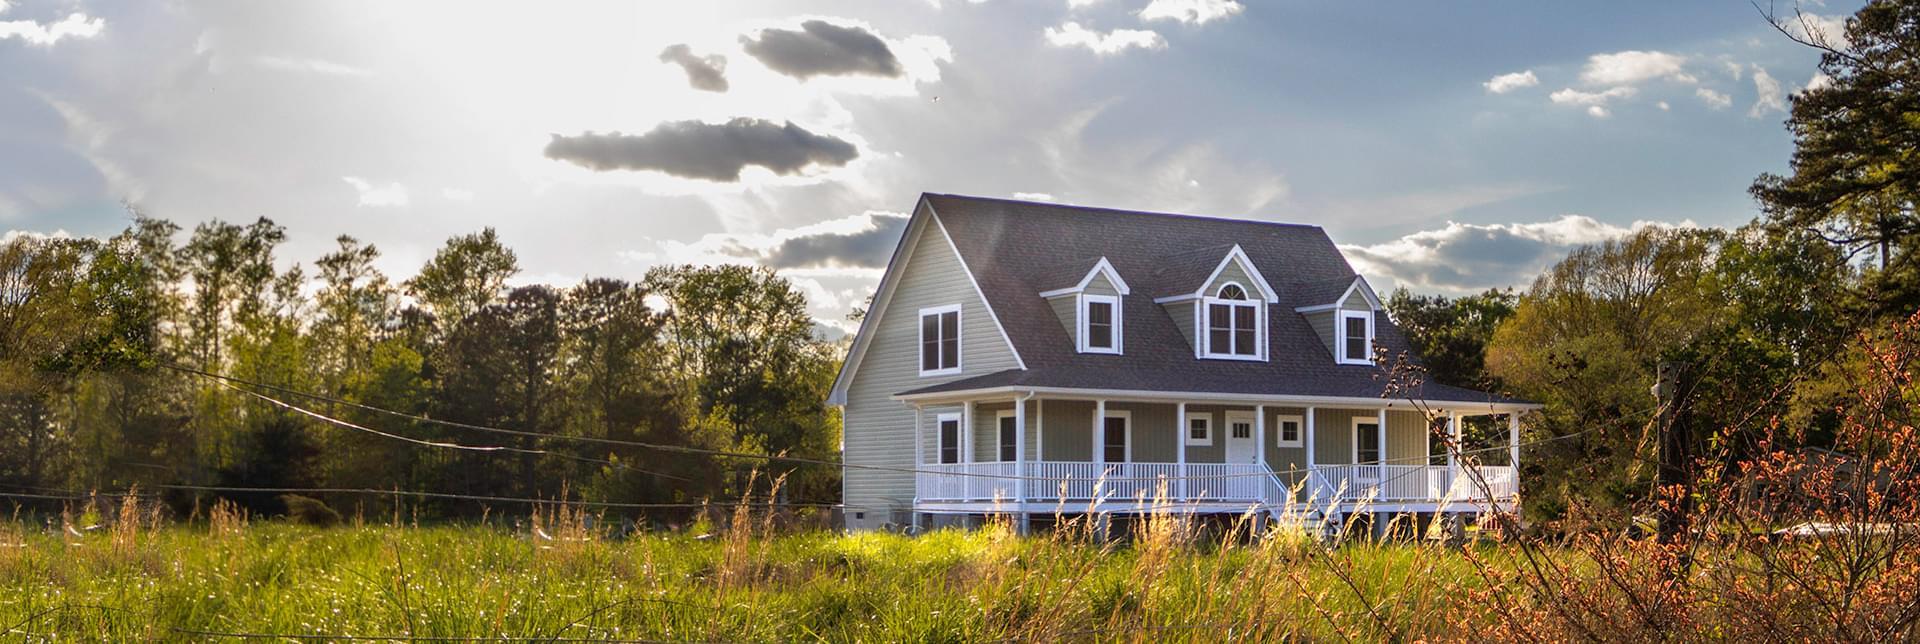 New Homes in Waynesboro VA